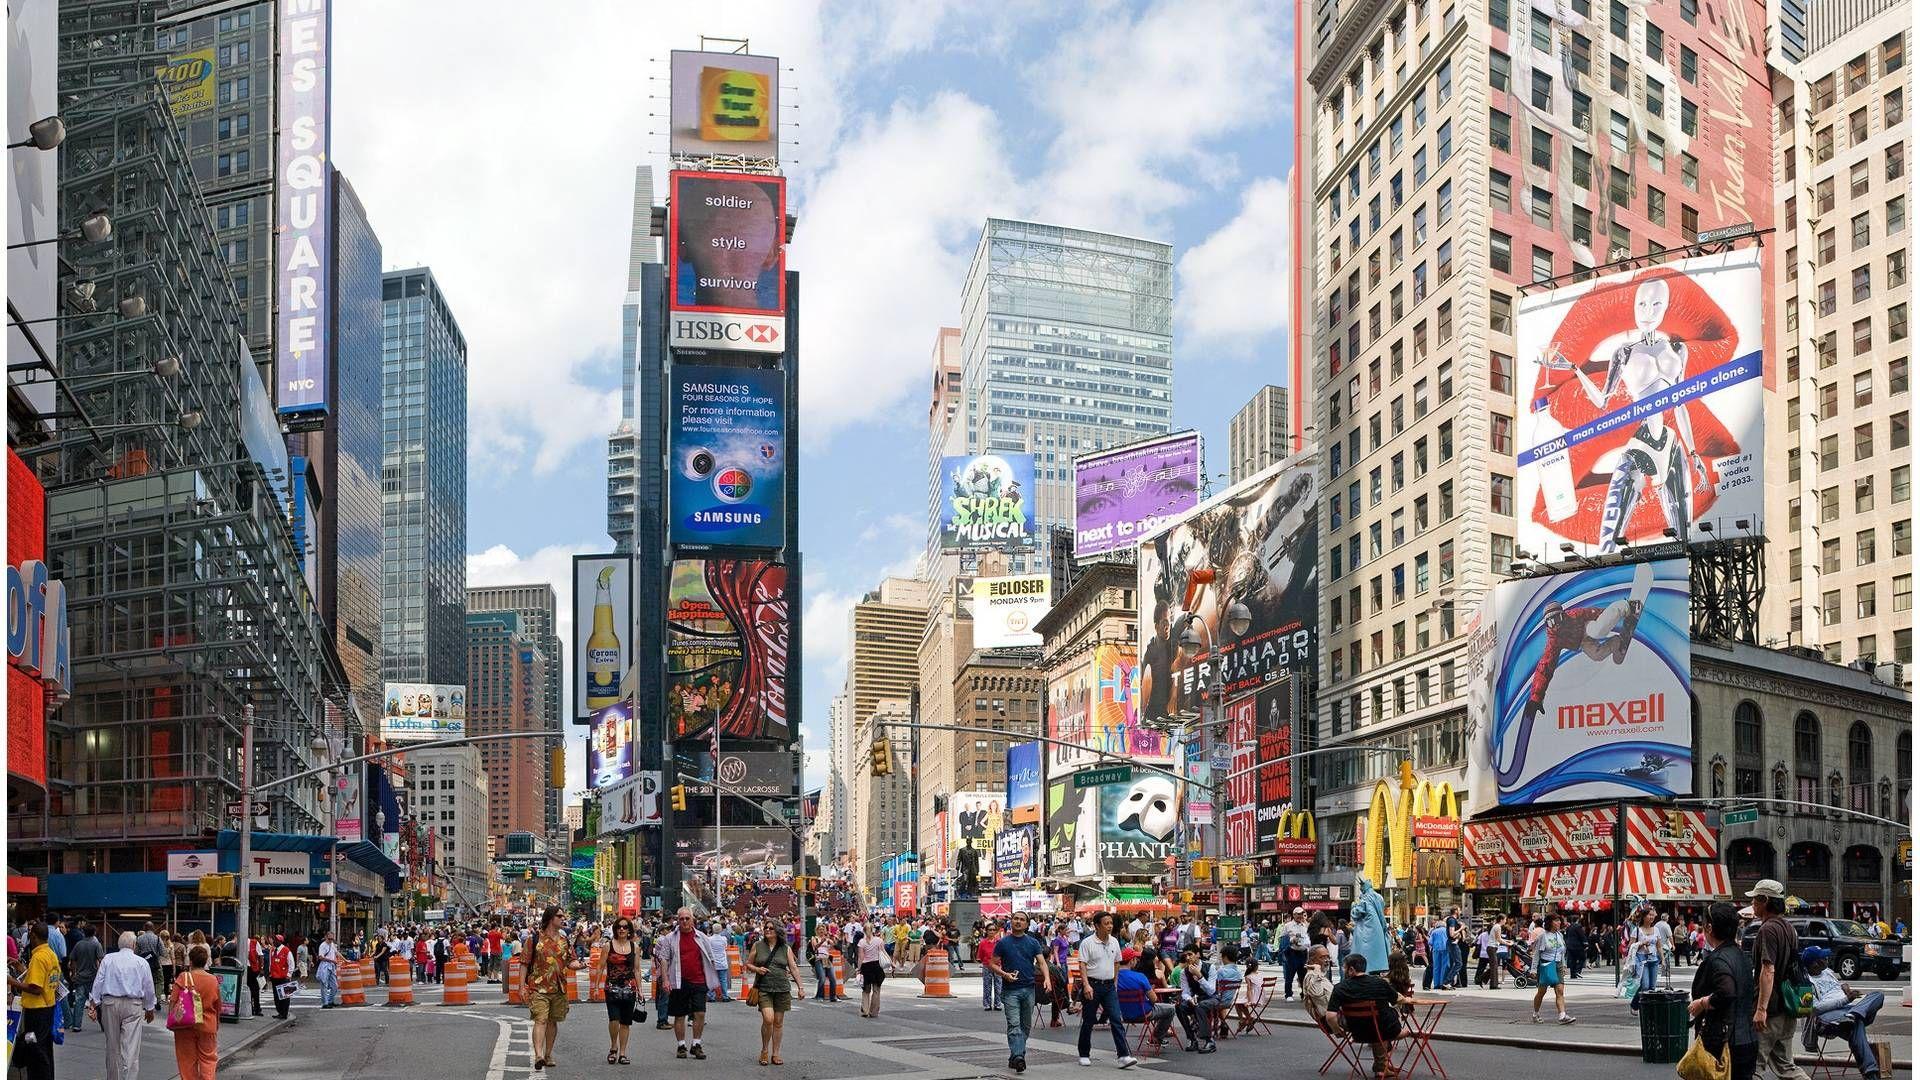 New York City 1920 1080 Wallpaper City Hd High Quality Pc New York City Shopping Times Square Times Square New York